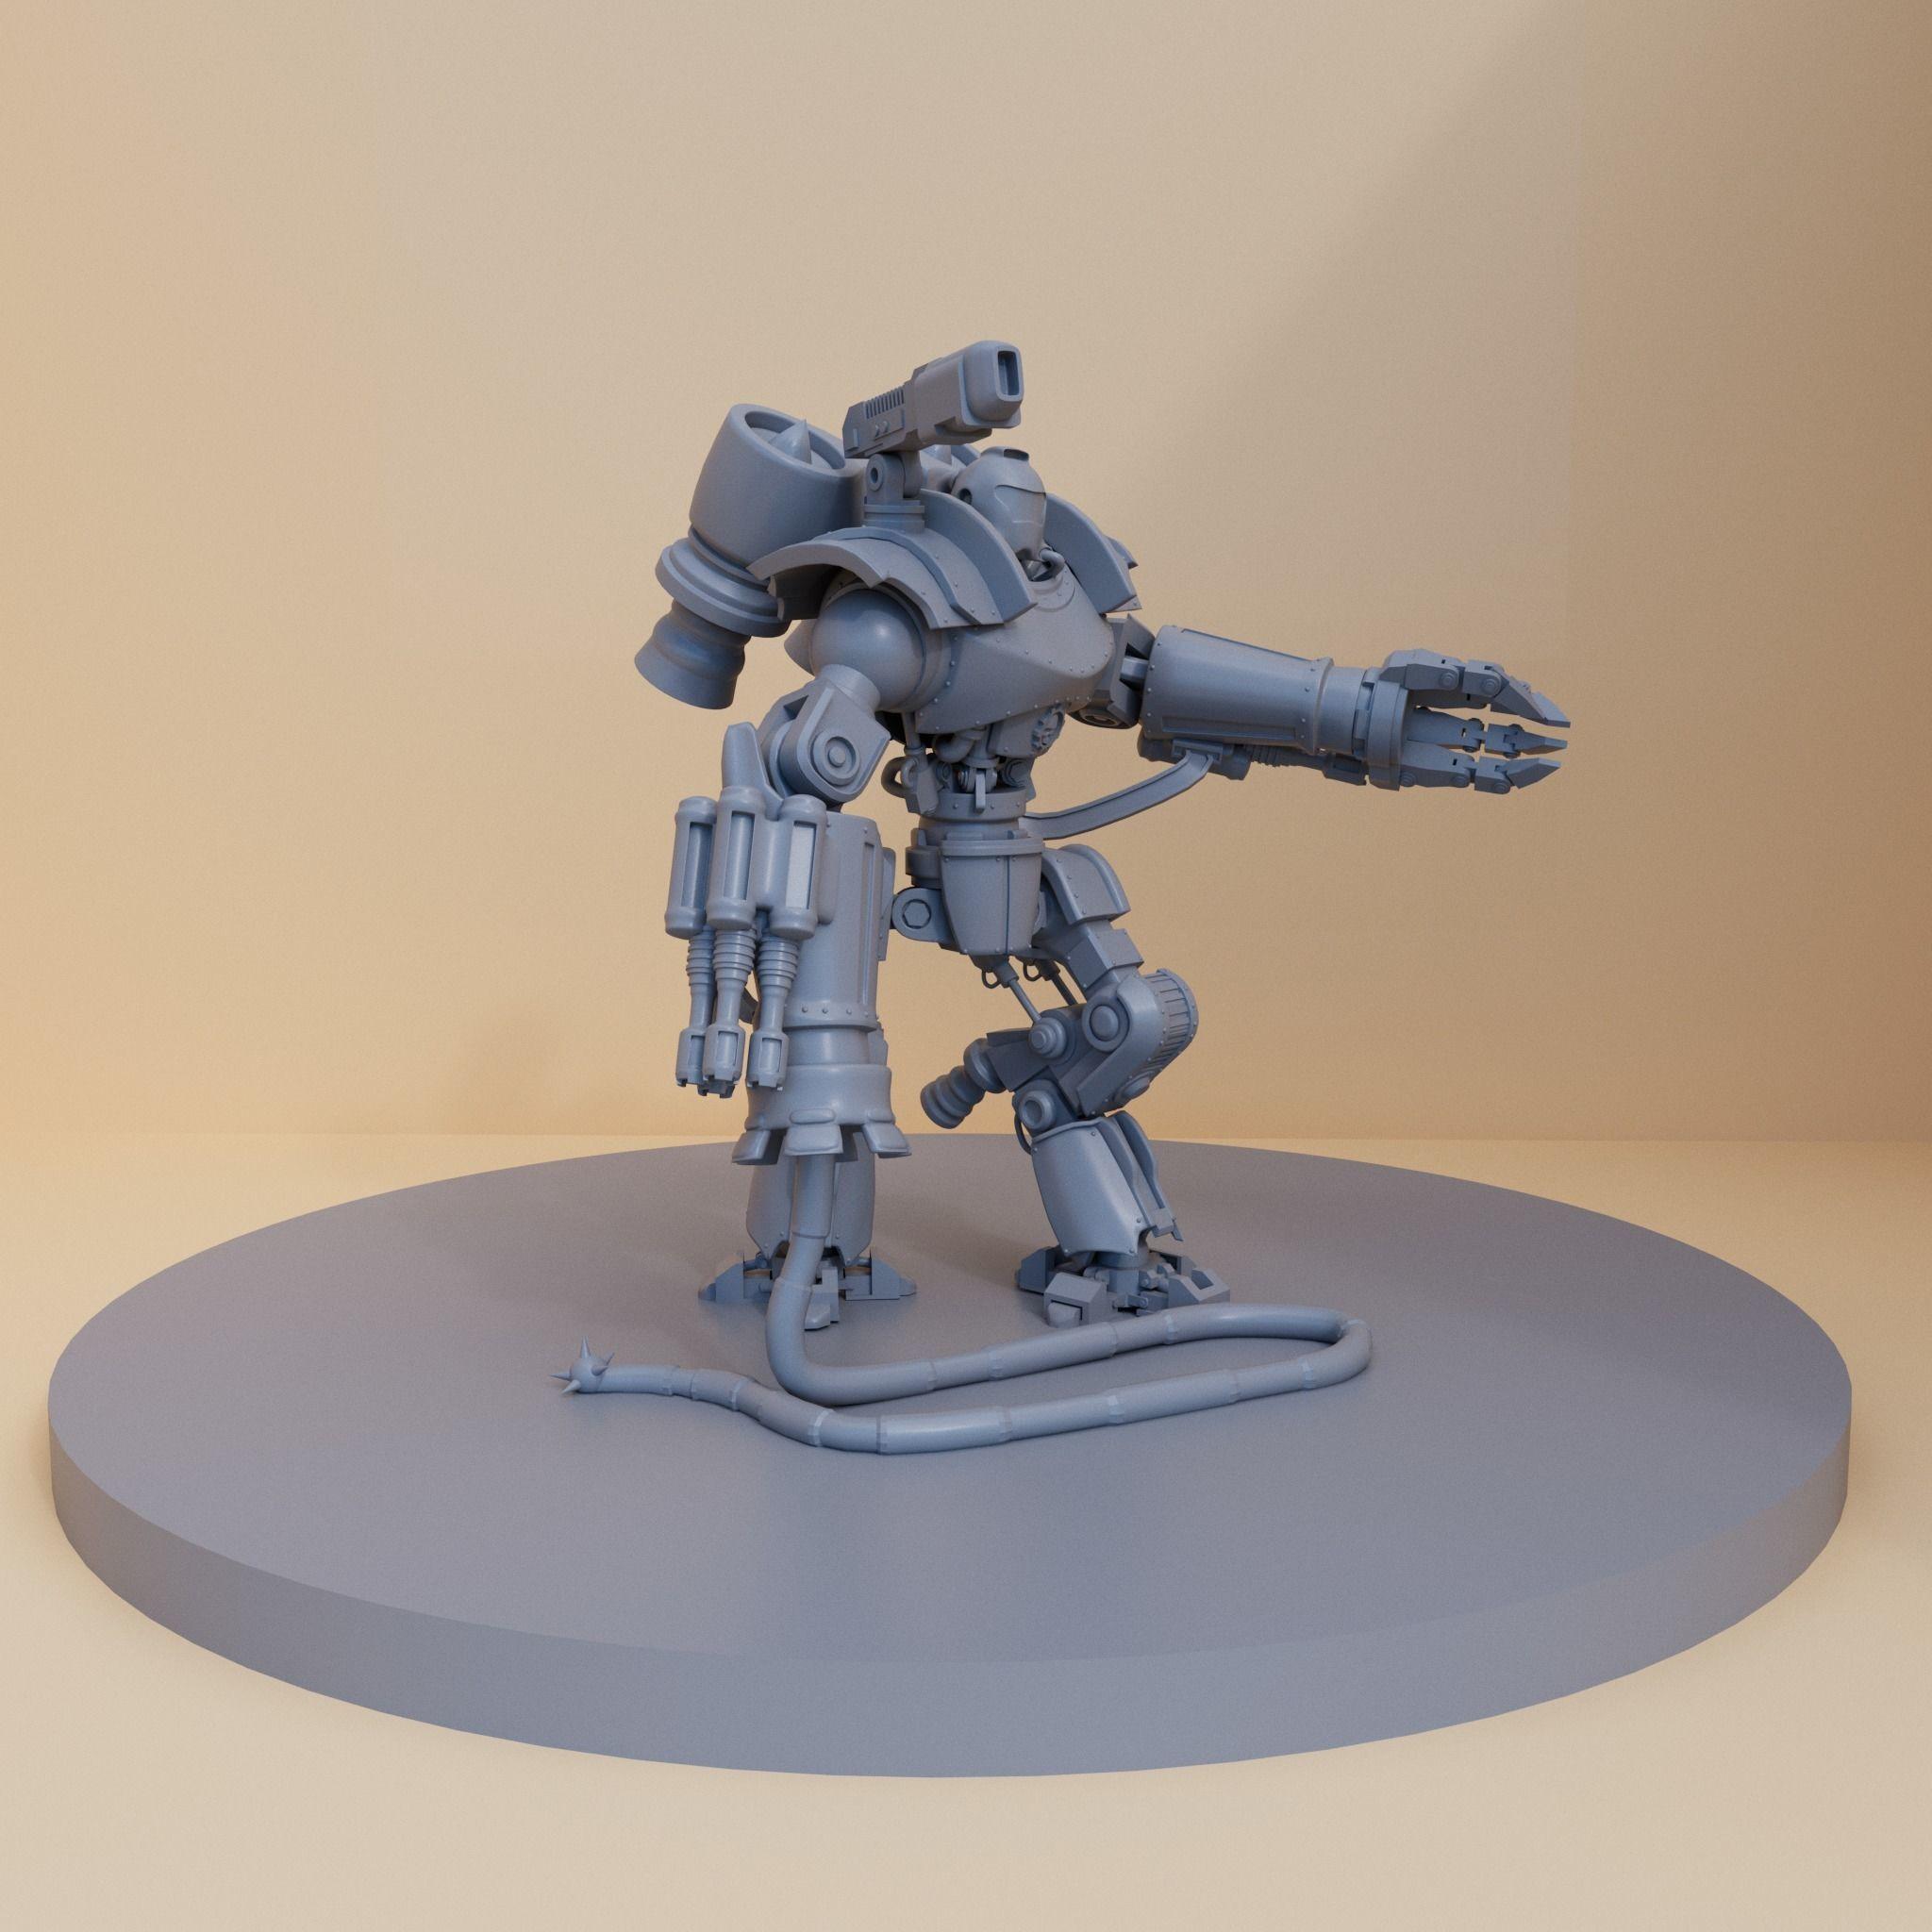 Justice robot